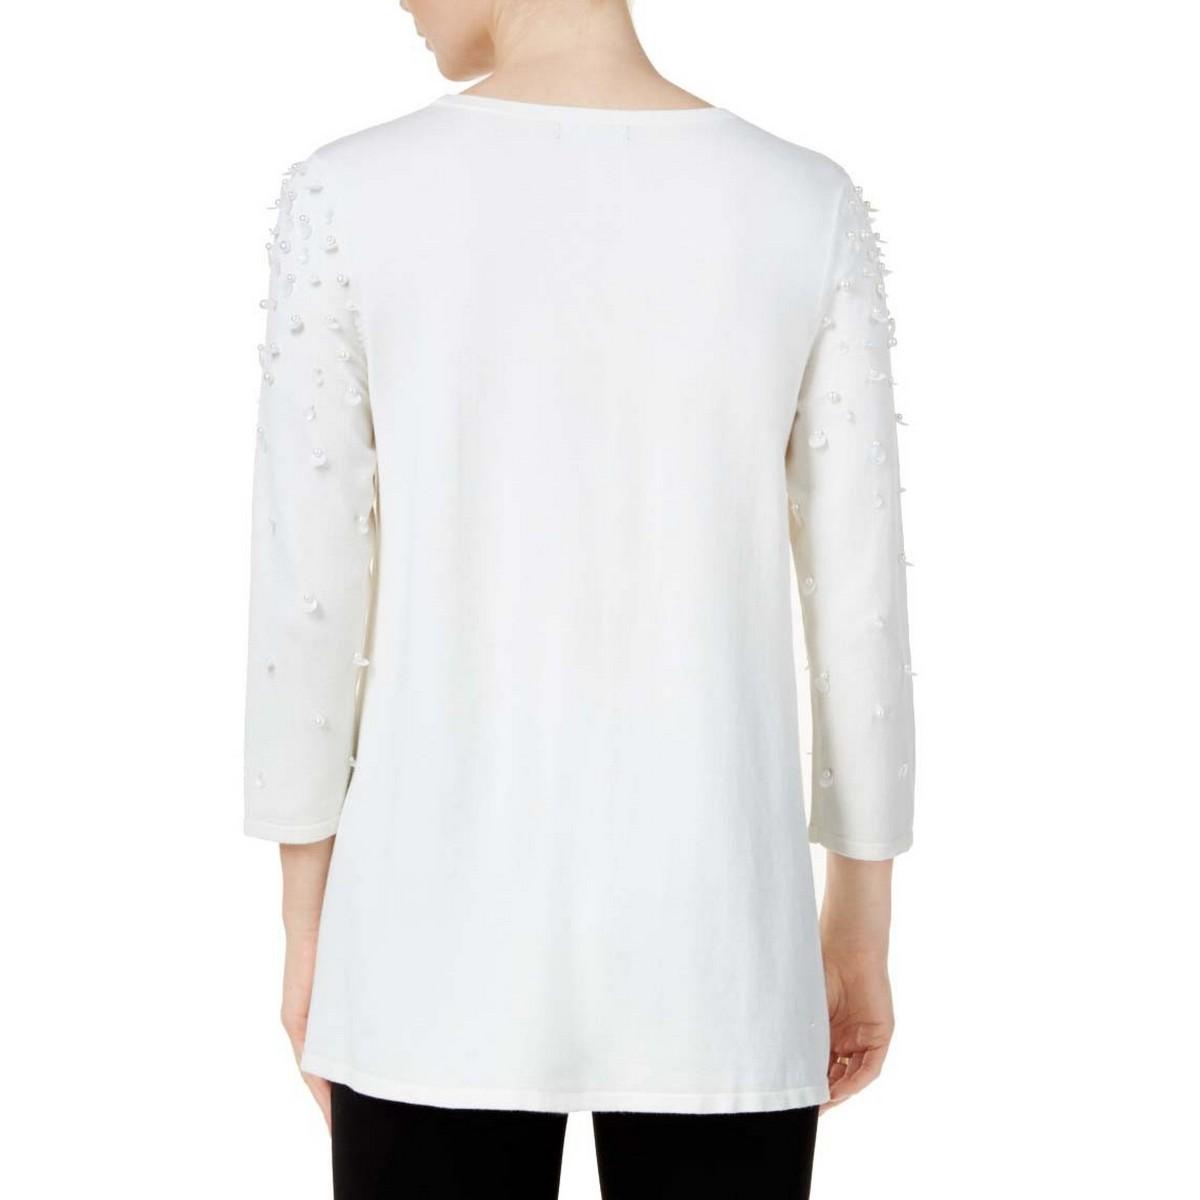 ALFANI-NEW-Women-039-s-3-4-Sleeve-Embellished-Crewneck-Sweater-Top-TEDO thumbnail 4